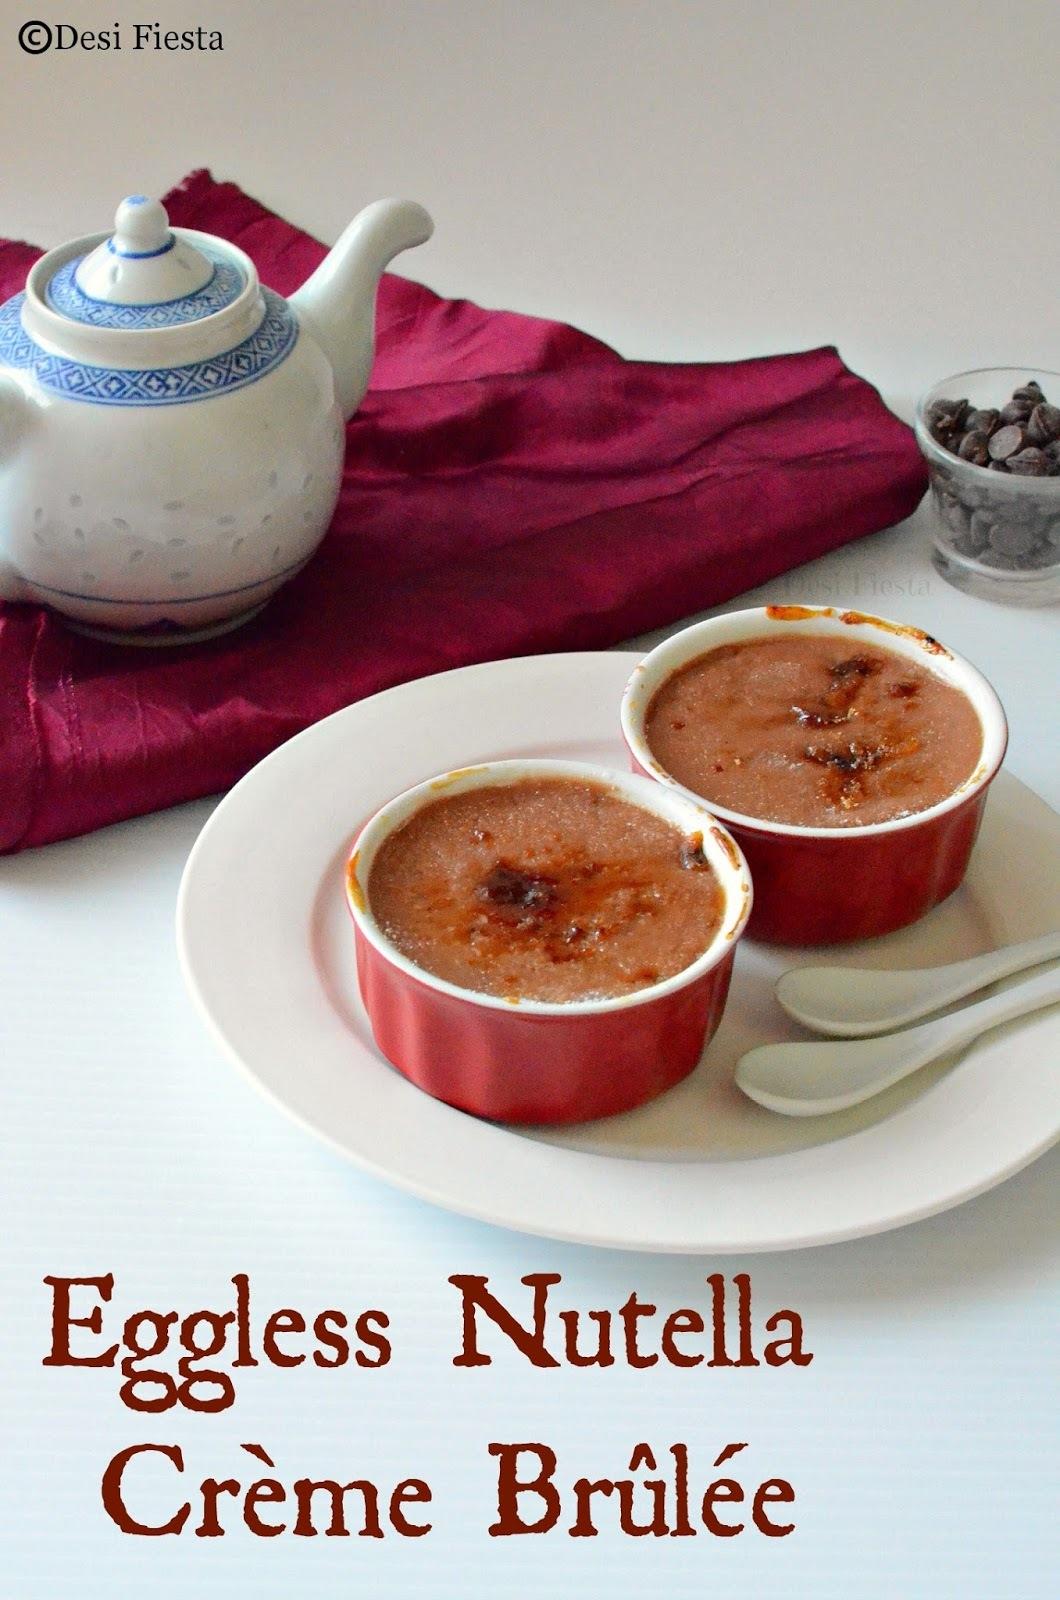 Eggless Nutella Crème Brûlée